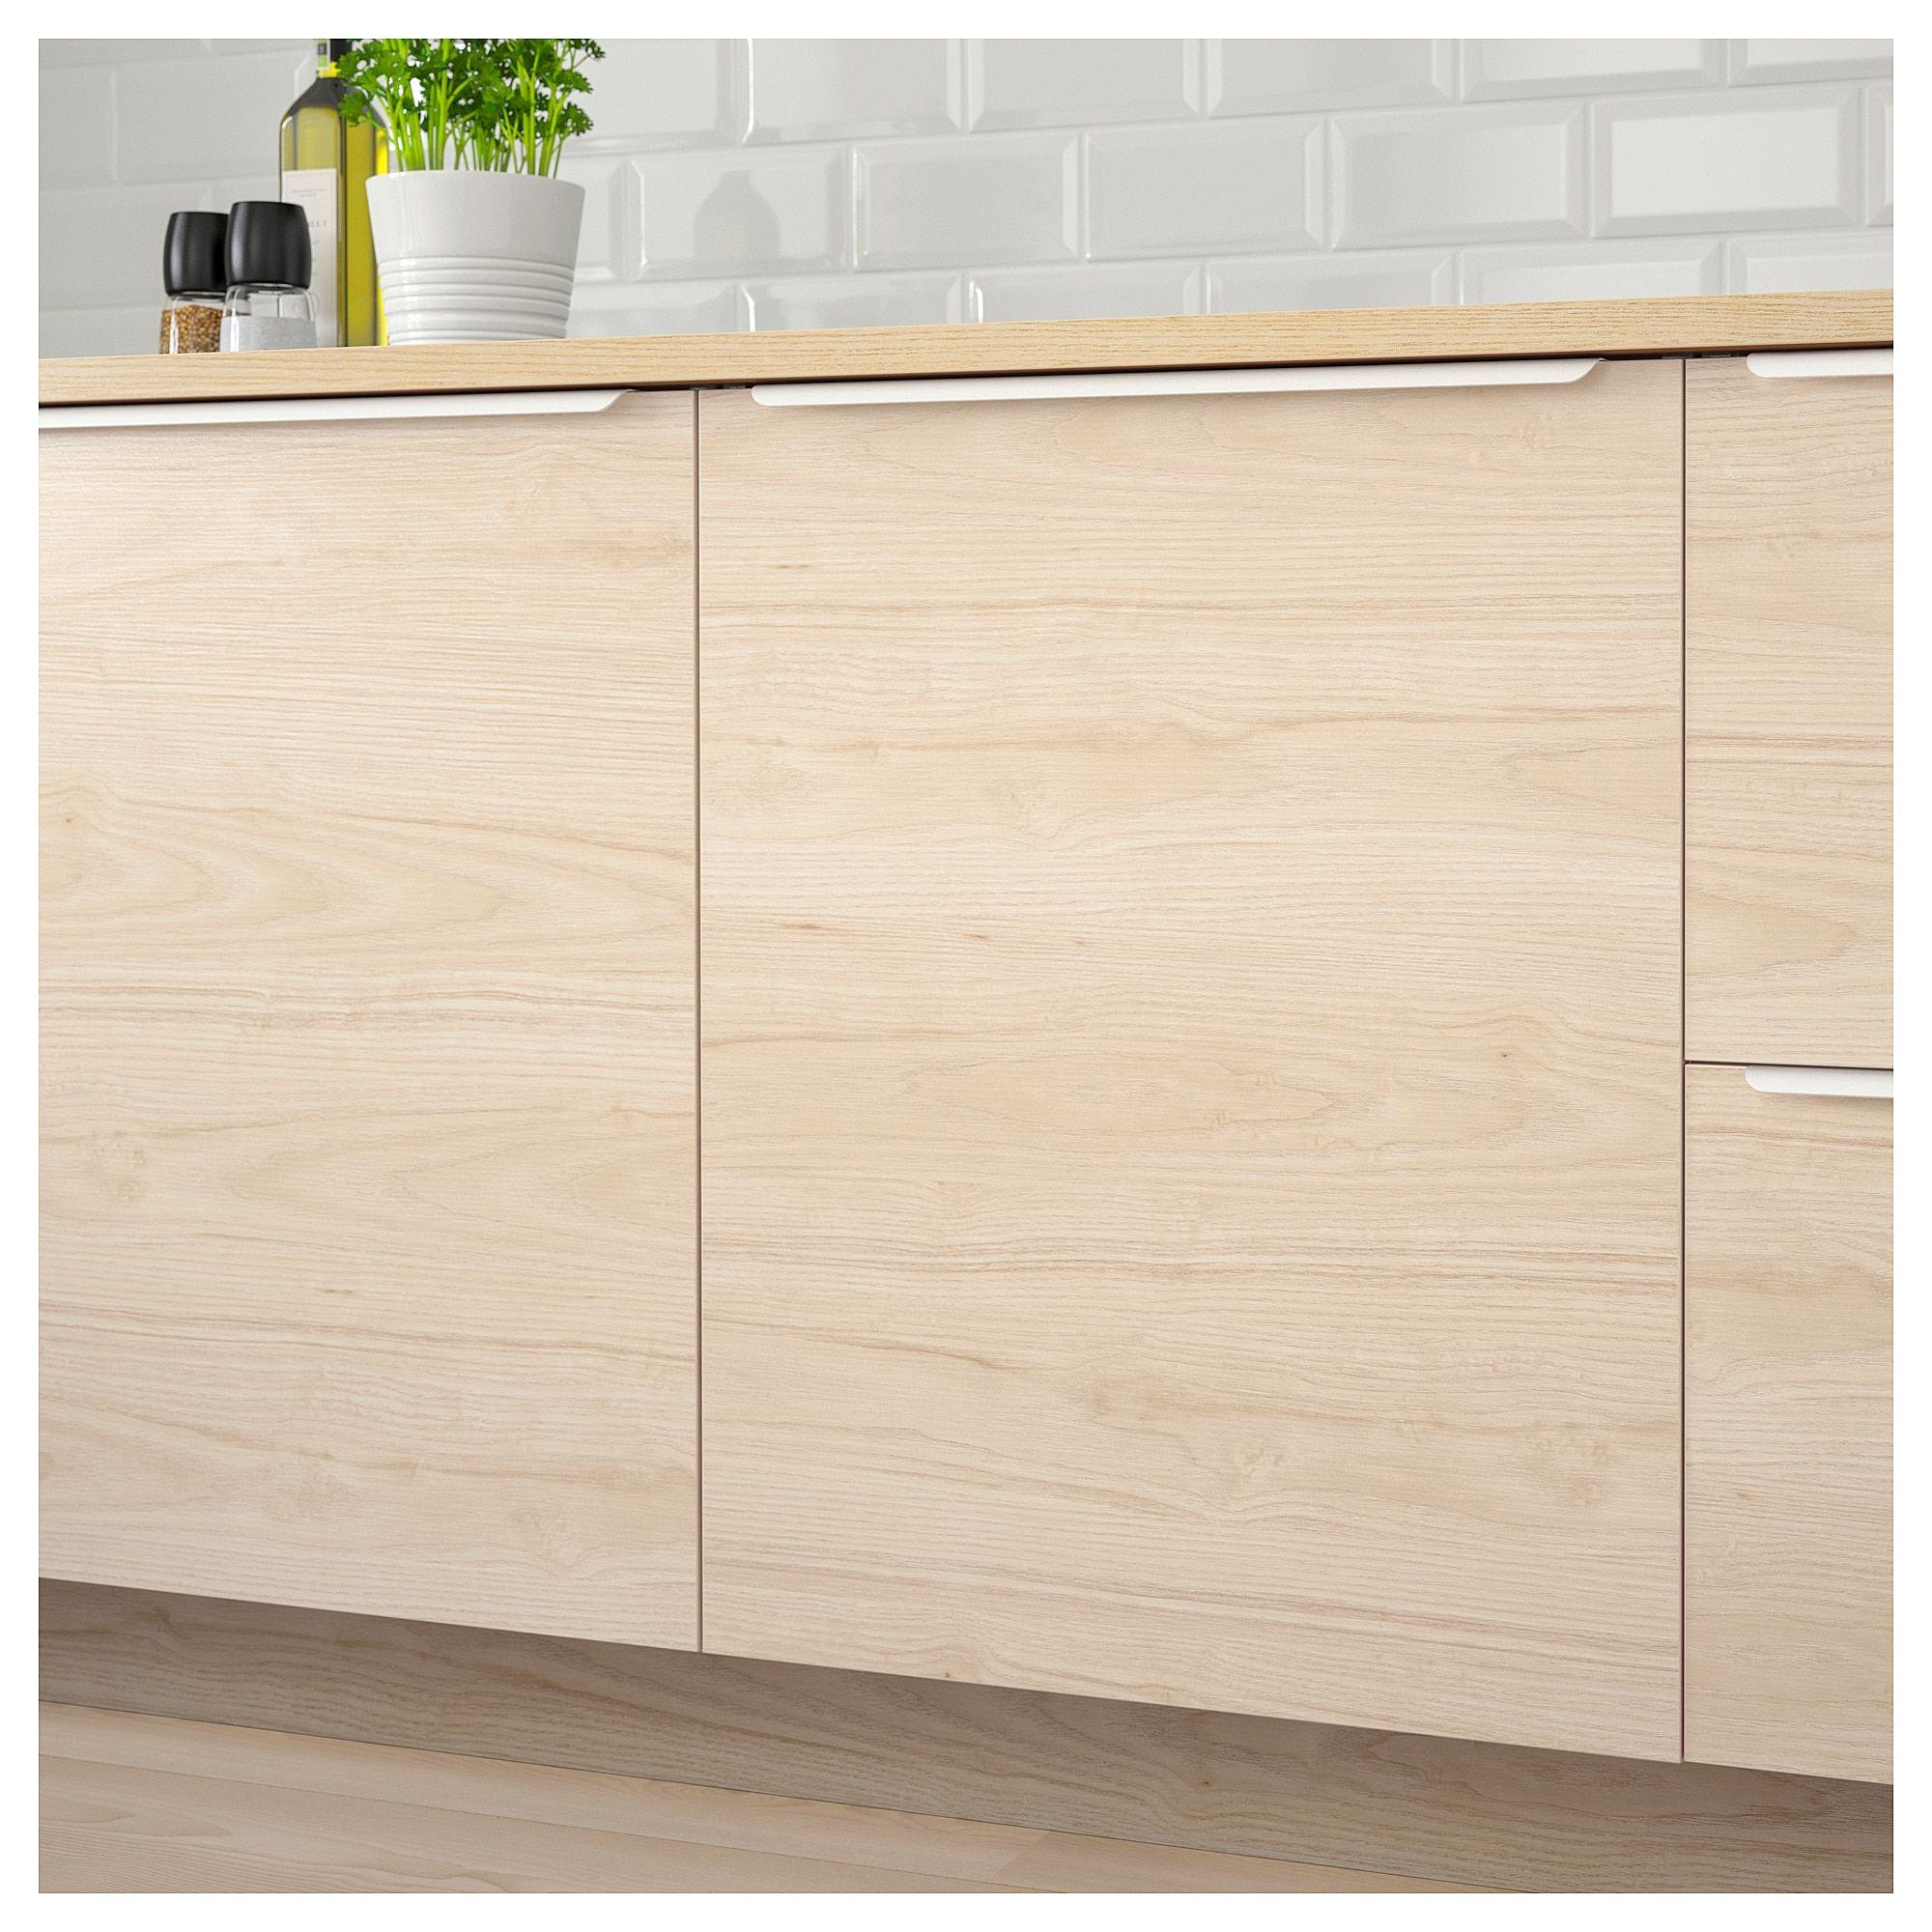 Askersund Door Light Ash Effect Ikea Kitchen Cabinets With Legs Ikea Ikea Kitchen